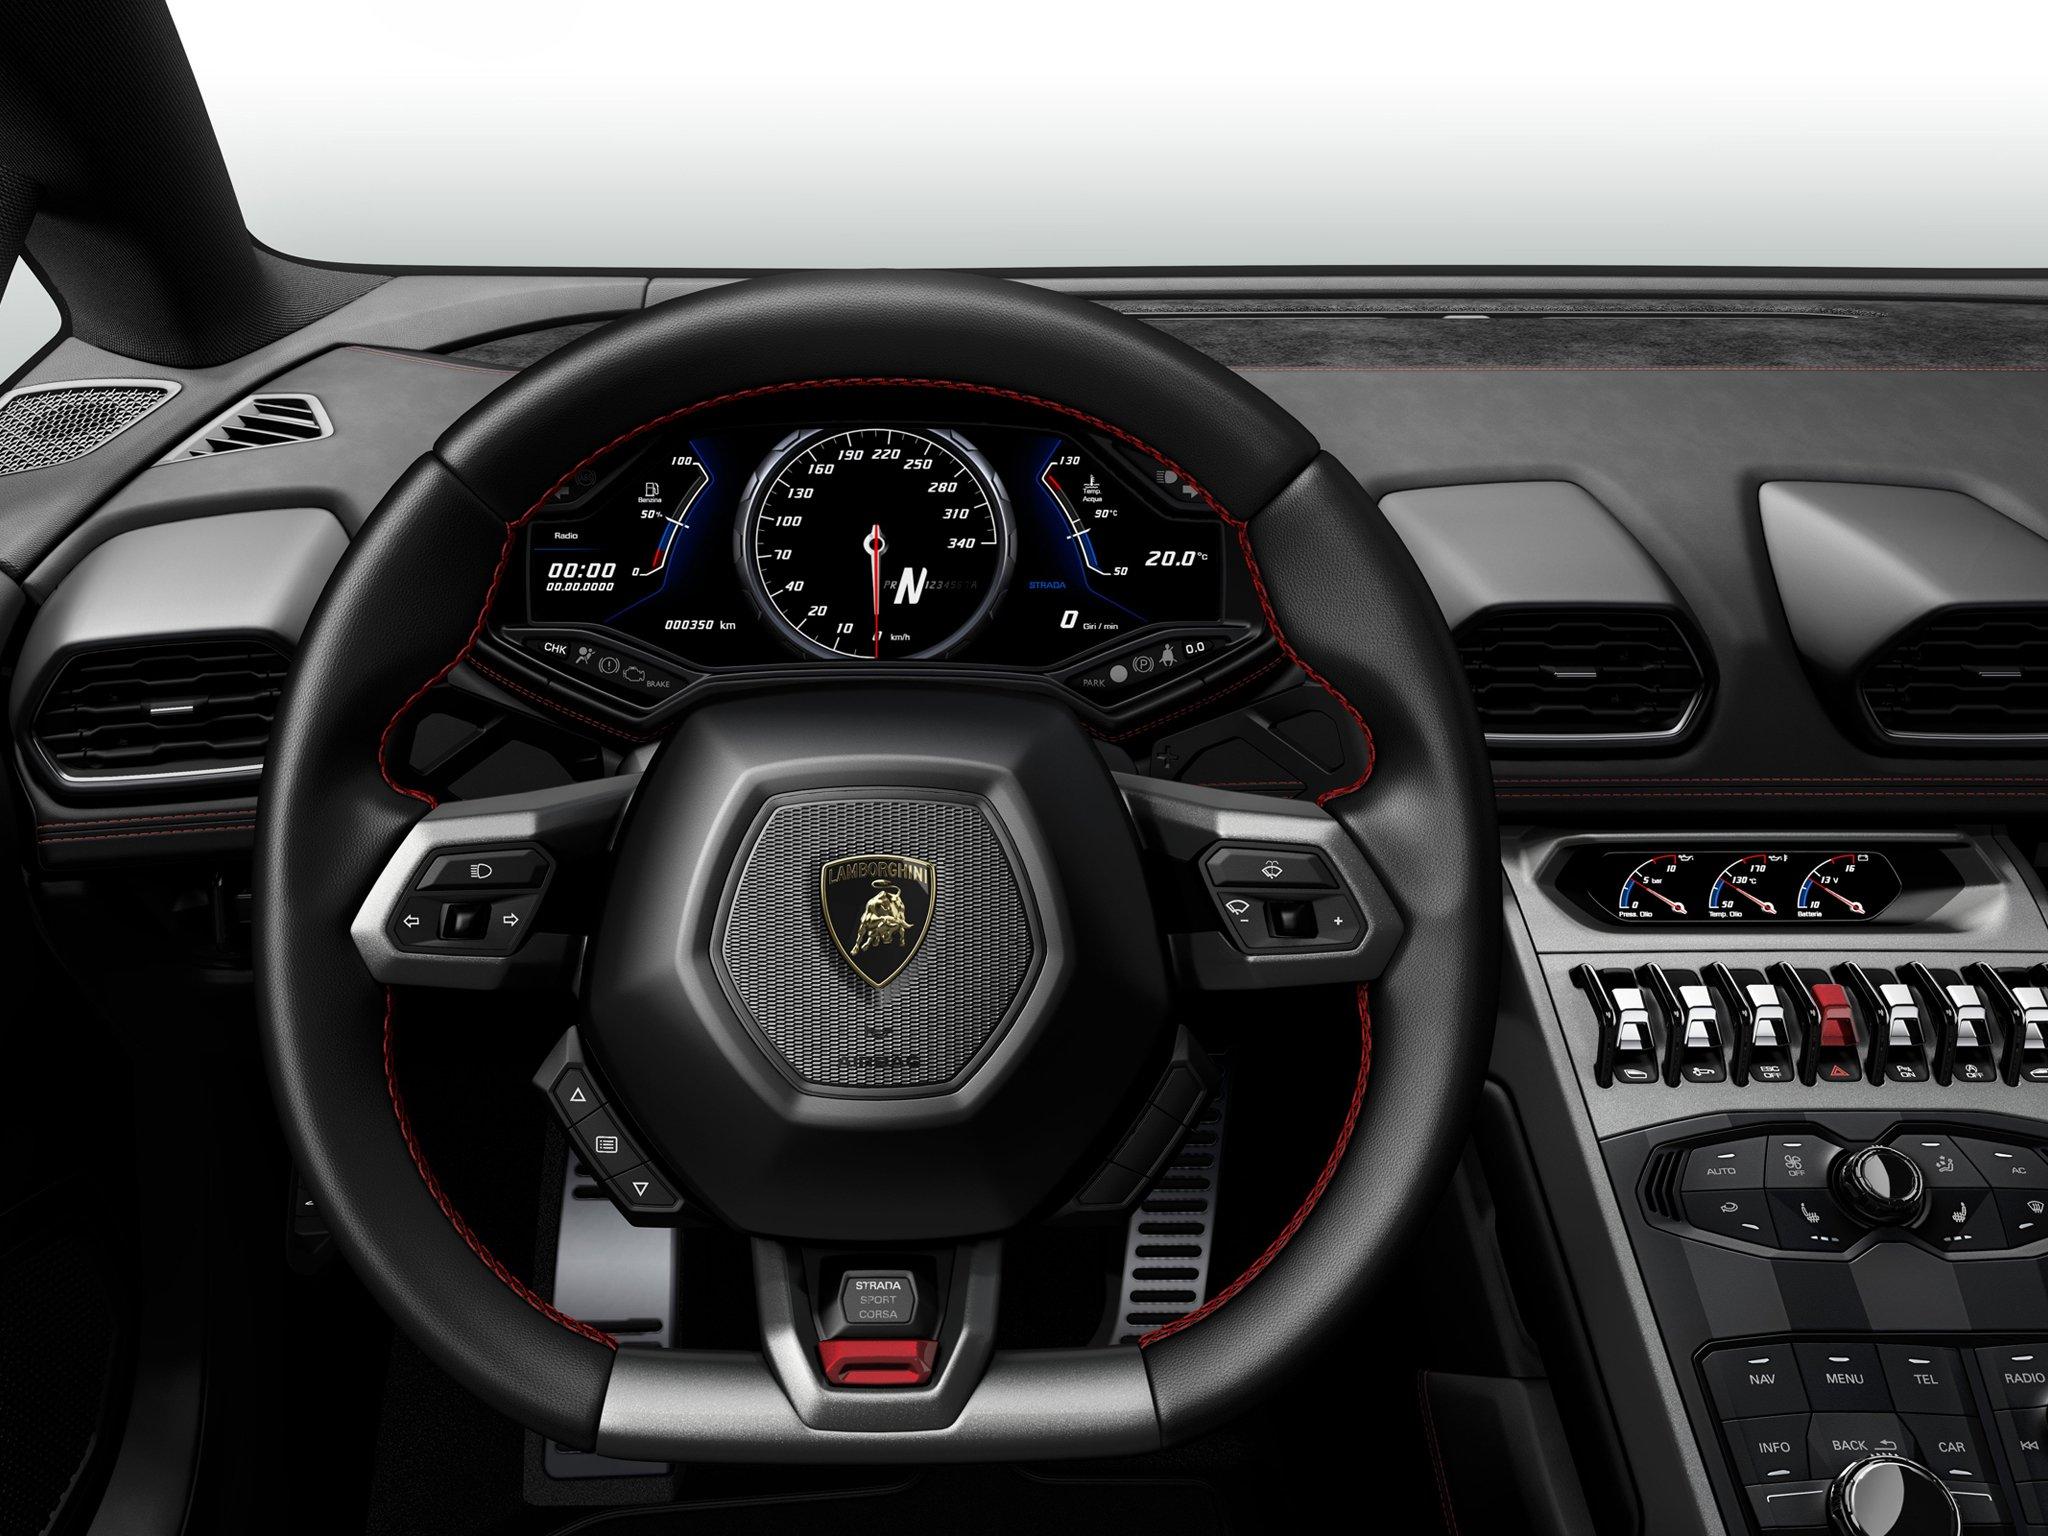 2014 lamborghini huracan lp 610 4 lb724 supercar - Lamborghini aventador interior wallpaper ...